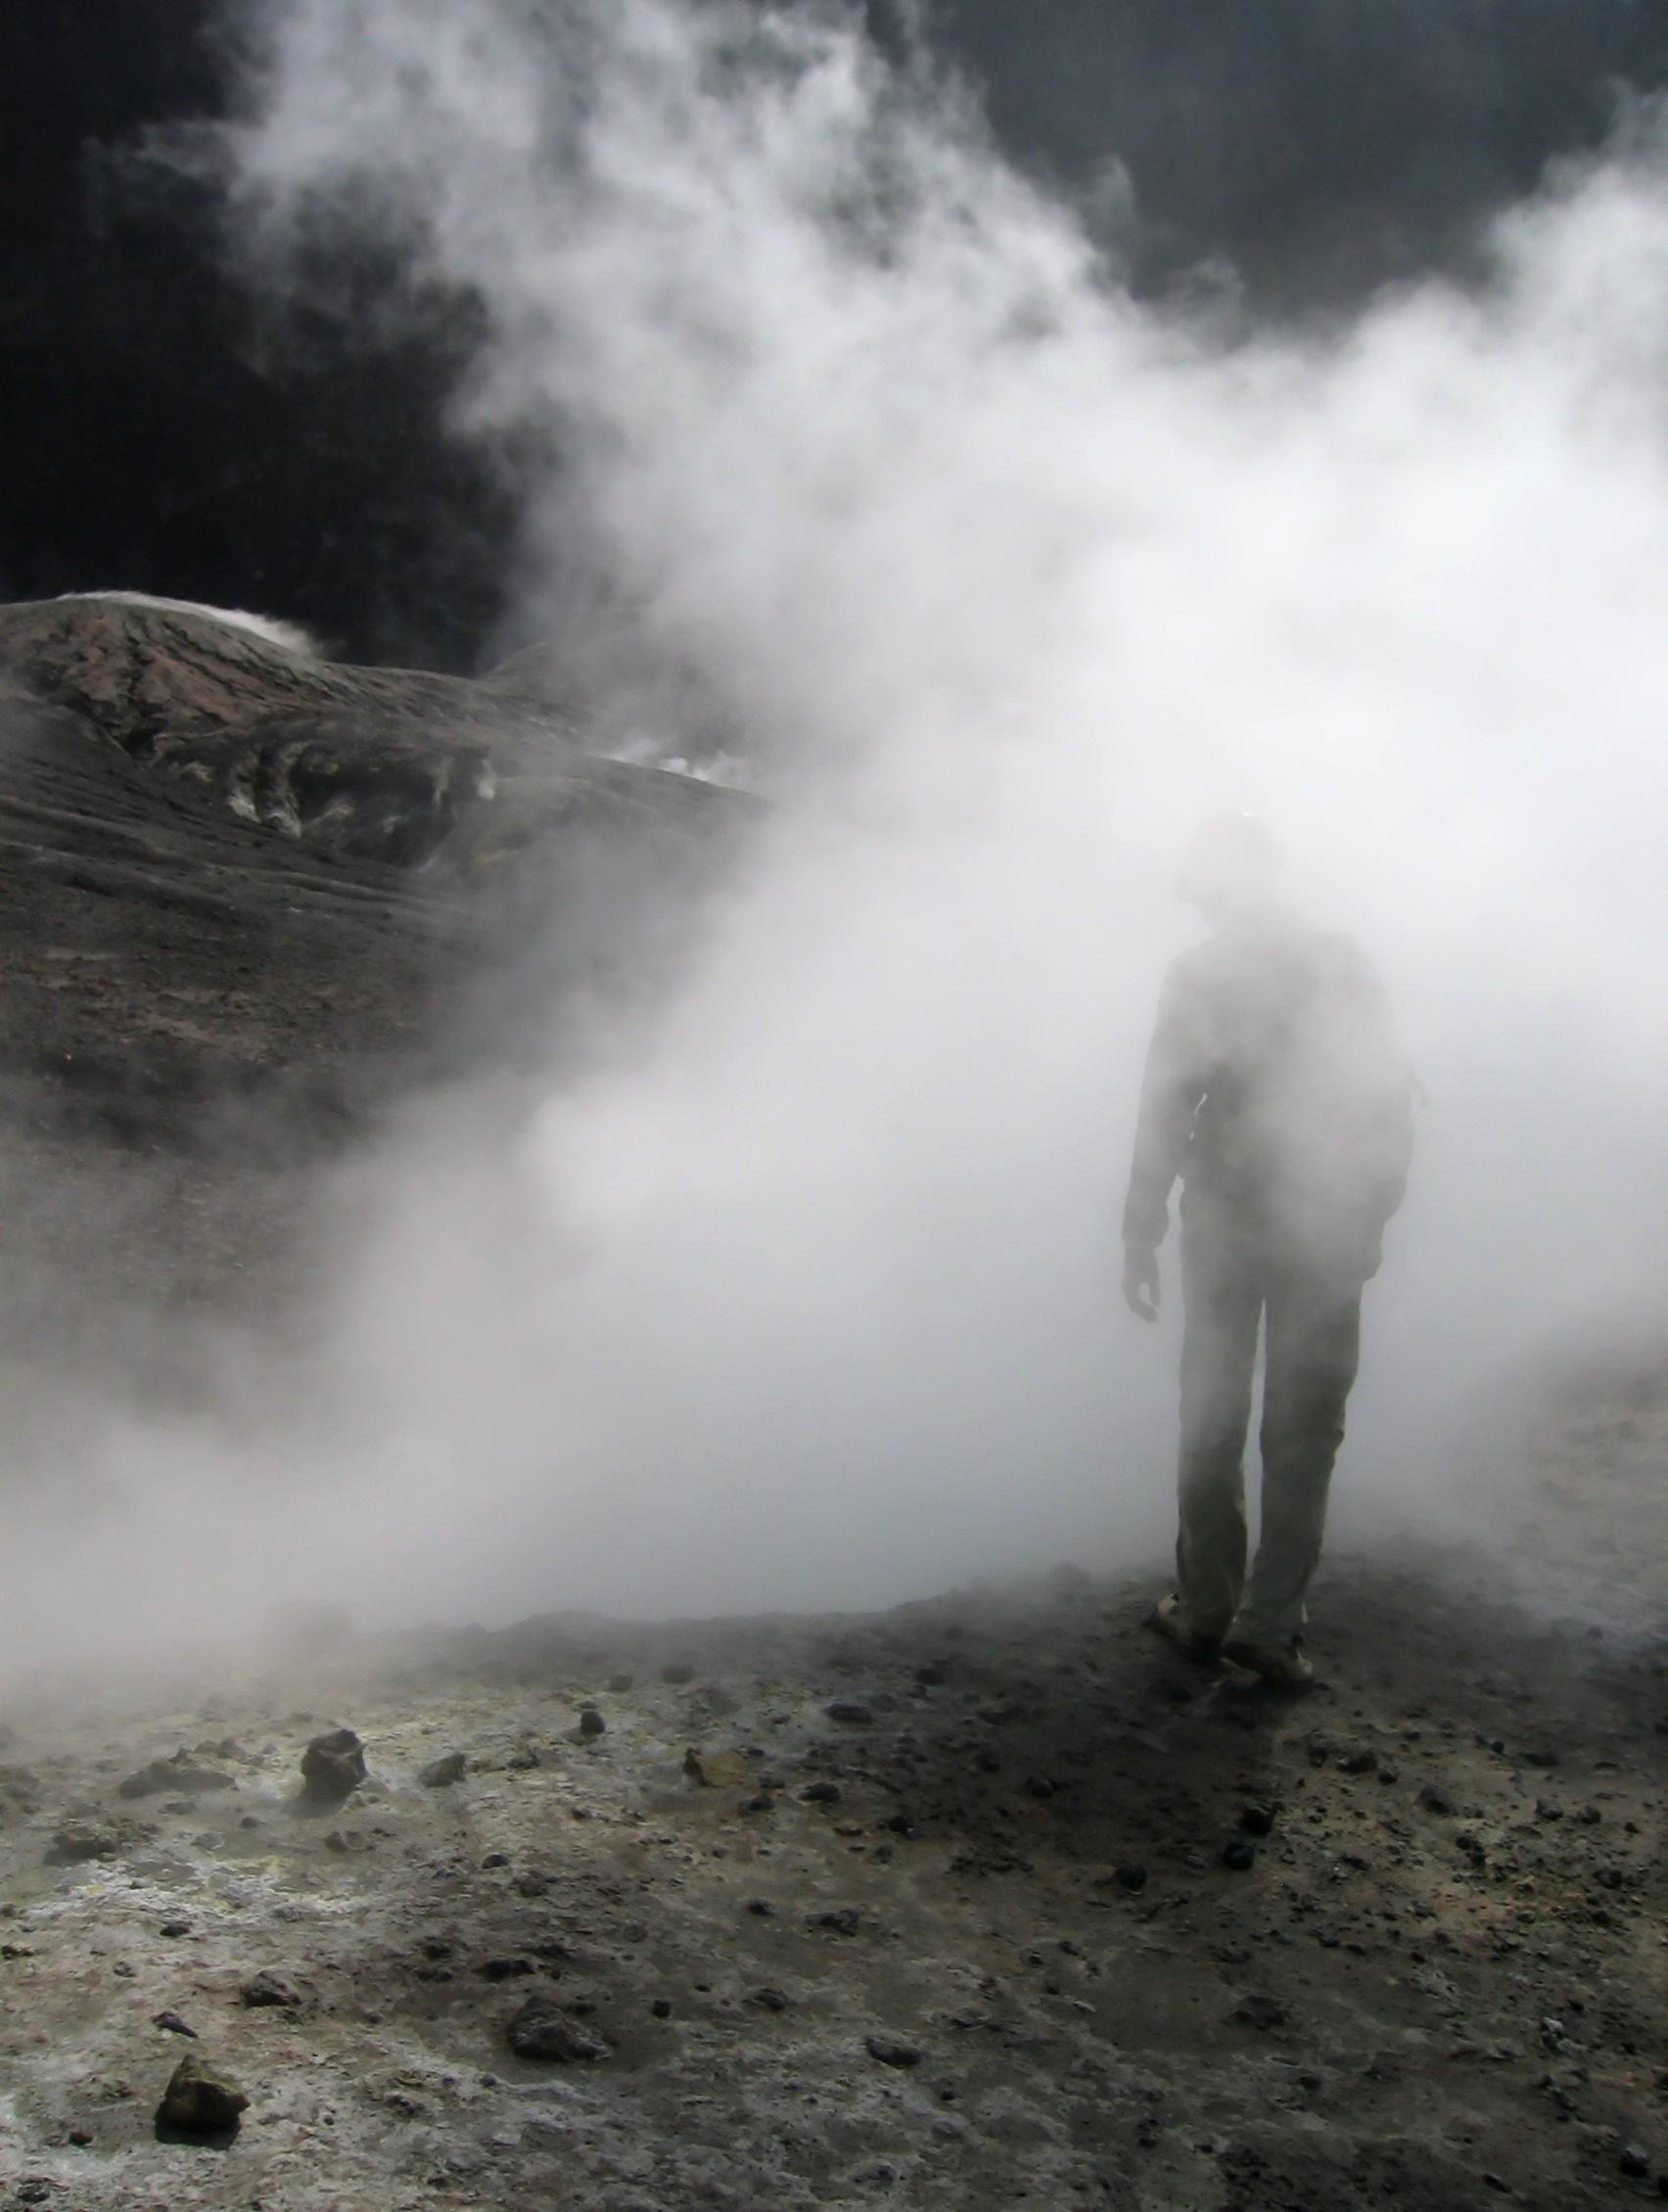 Images of mist